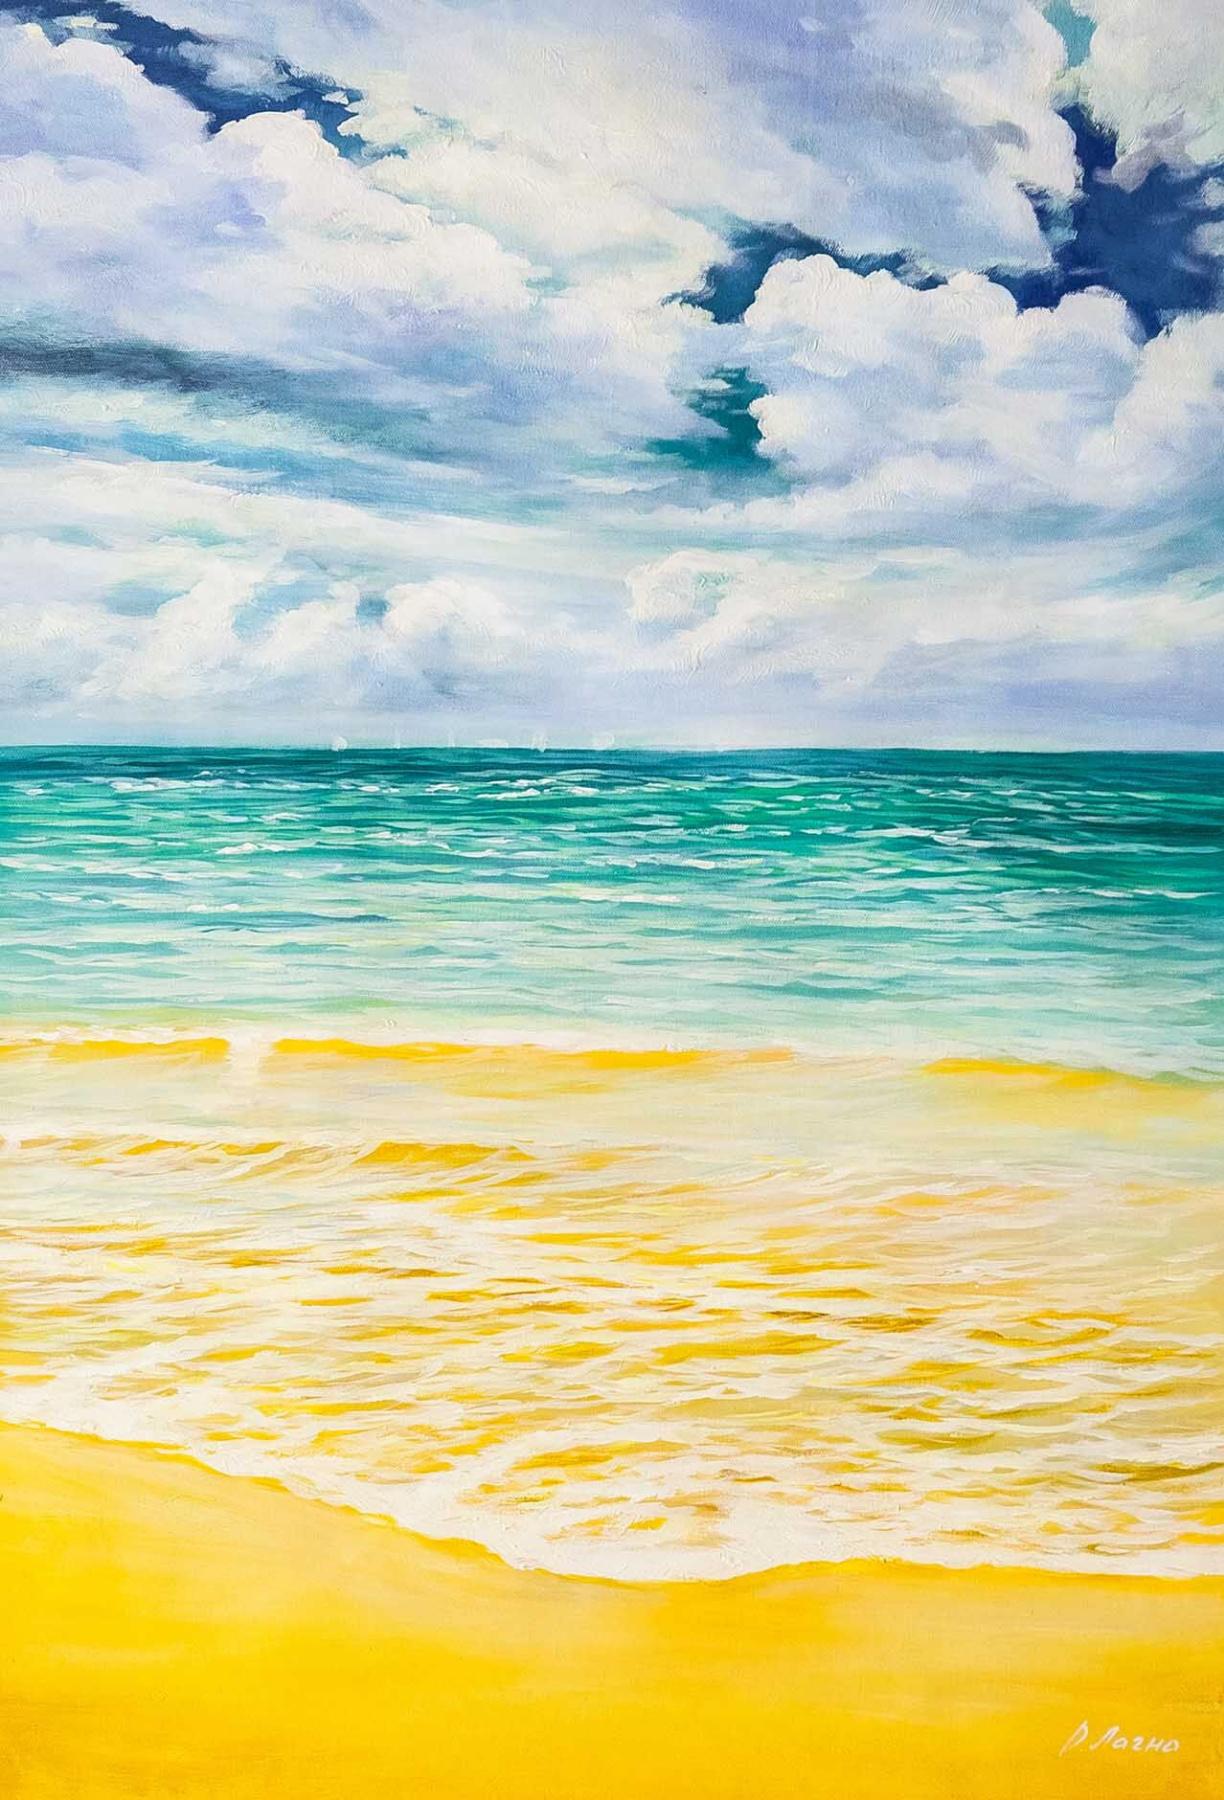 Daria Feliksovna Lagno. In the Emerald Sea N3